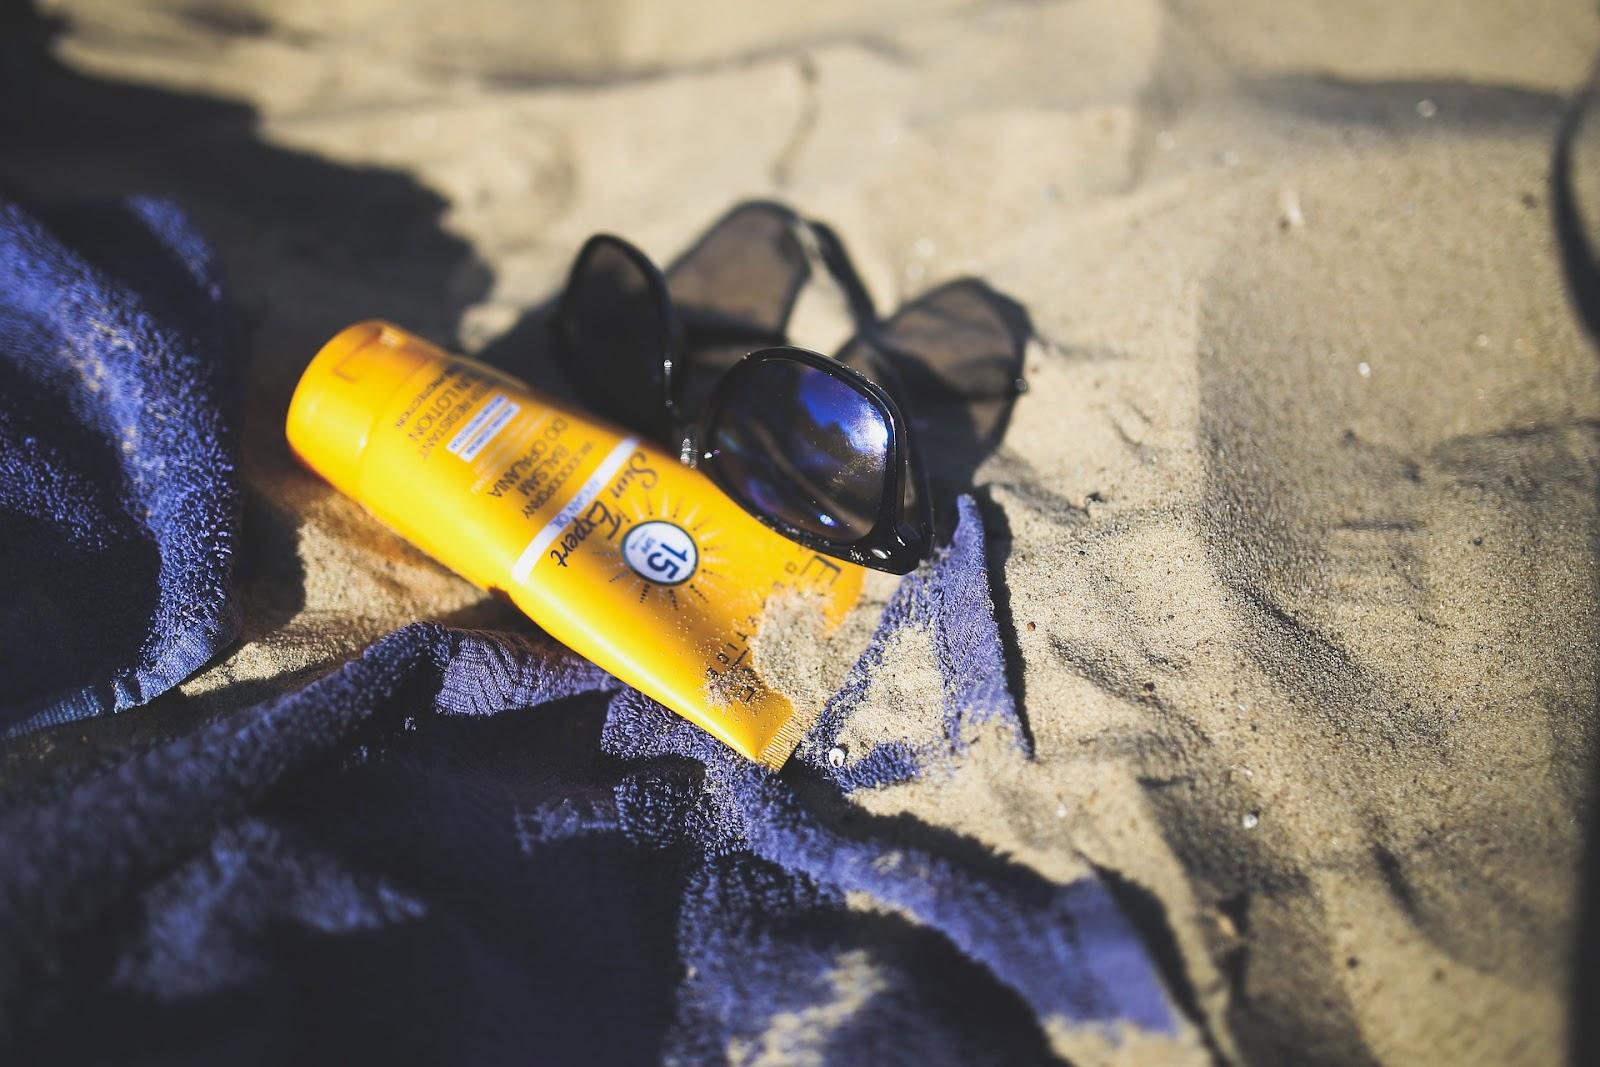 krem z filtrem na plaży - jaki krem z filtrem dla maluszka